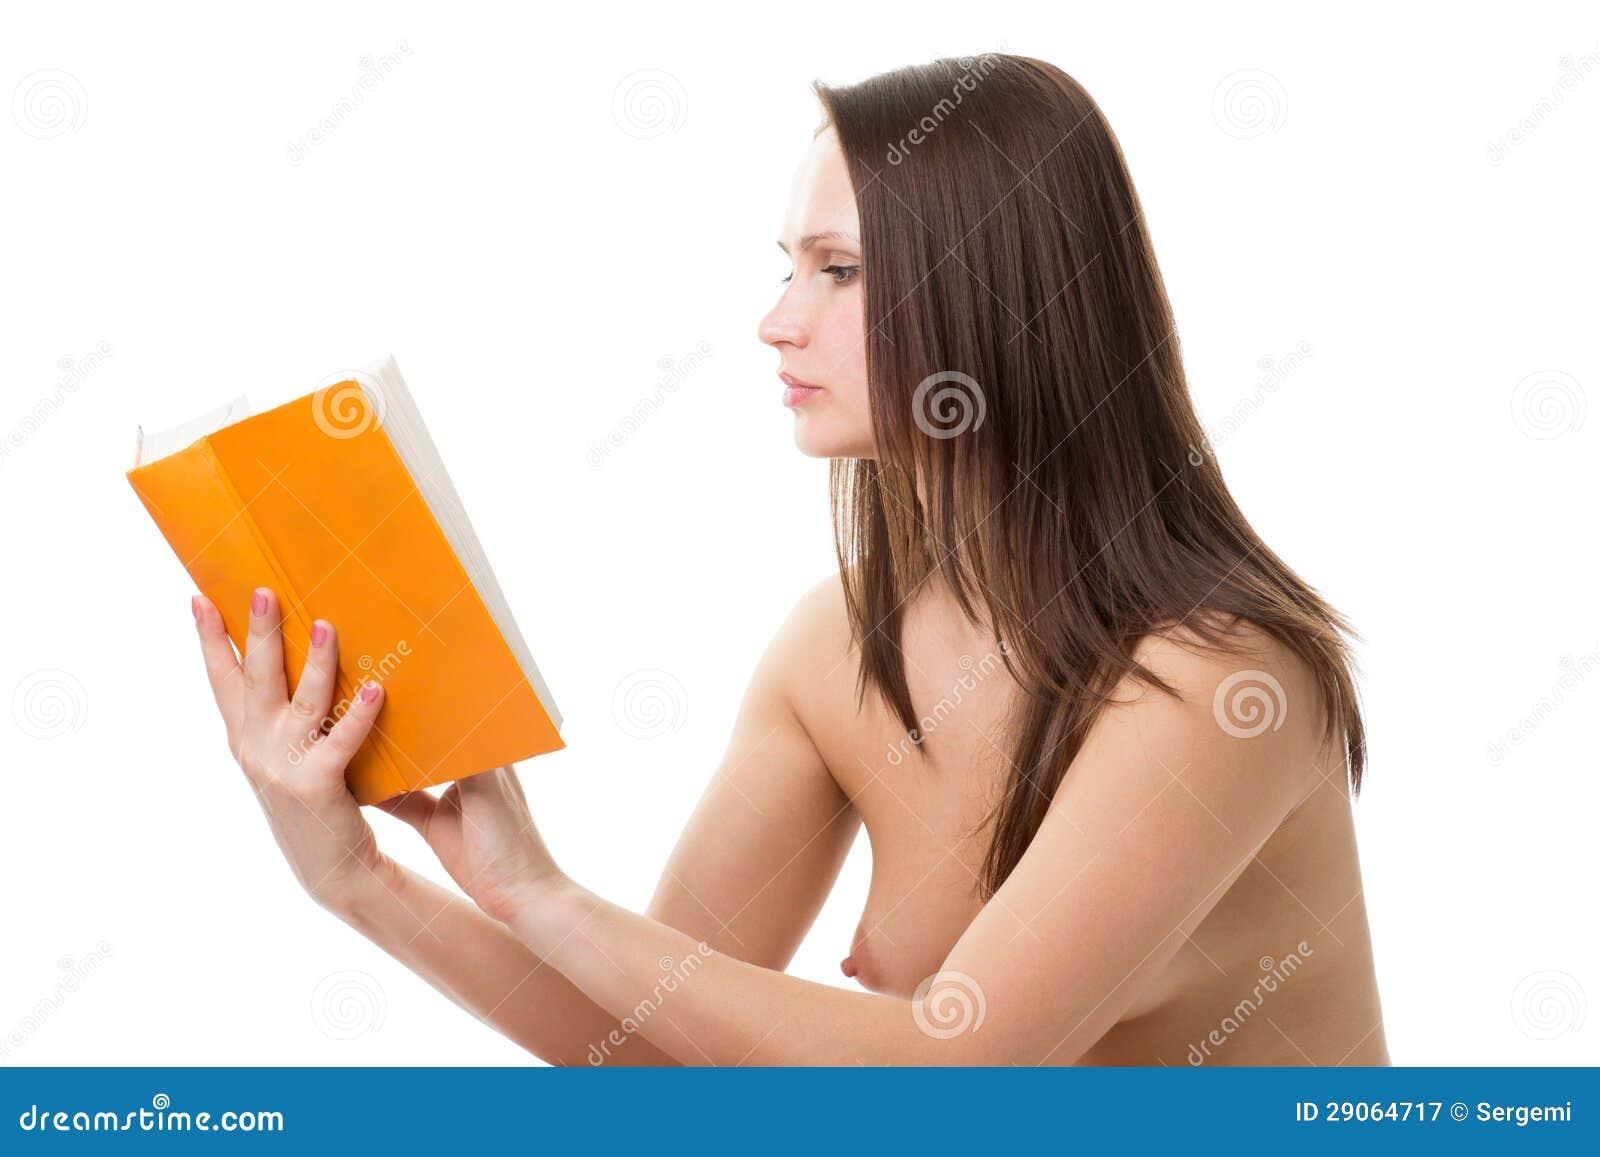 Useful nude reading a book amusing piece was